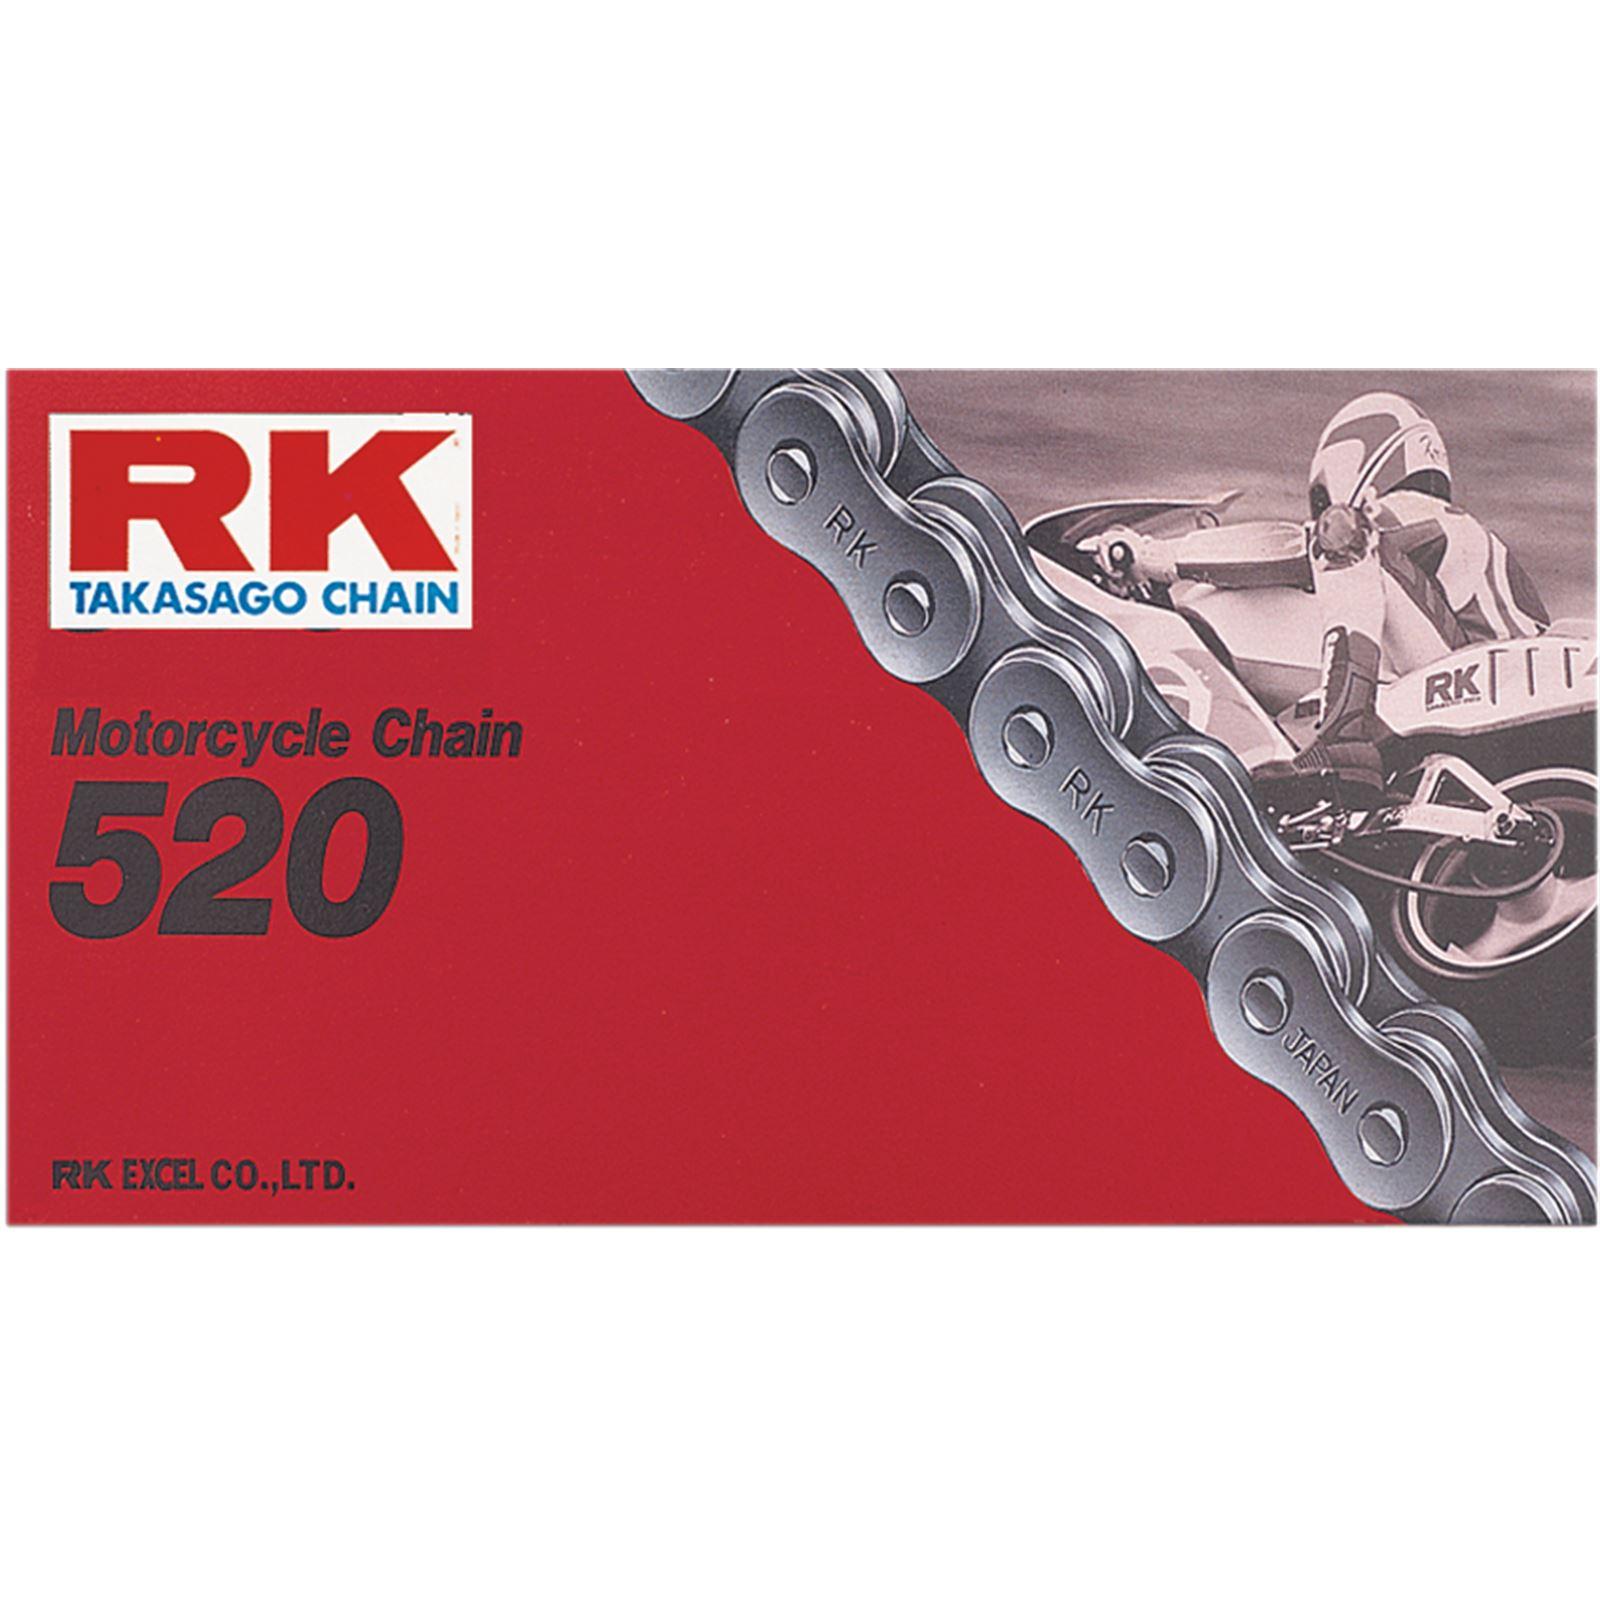 RK Excel M520 - Standard Chain - 98 Links